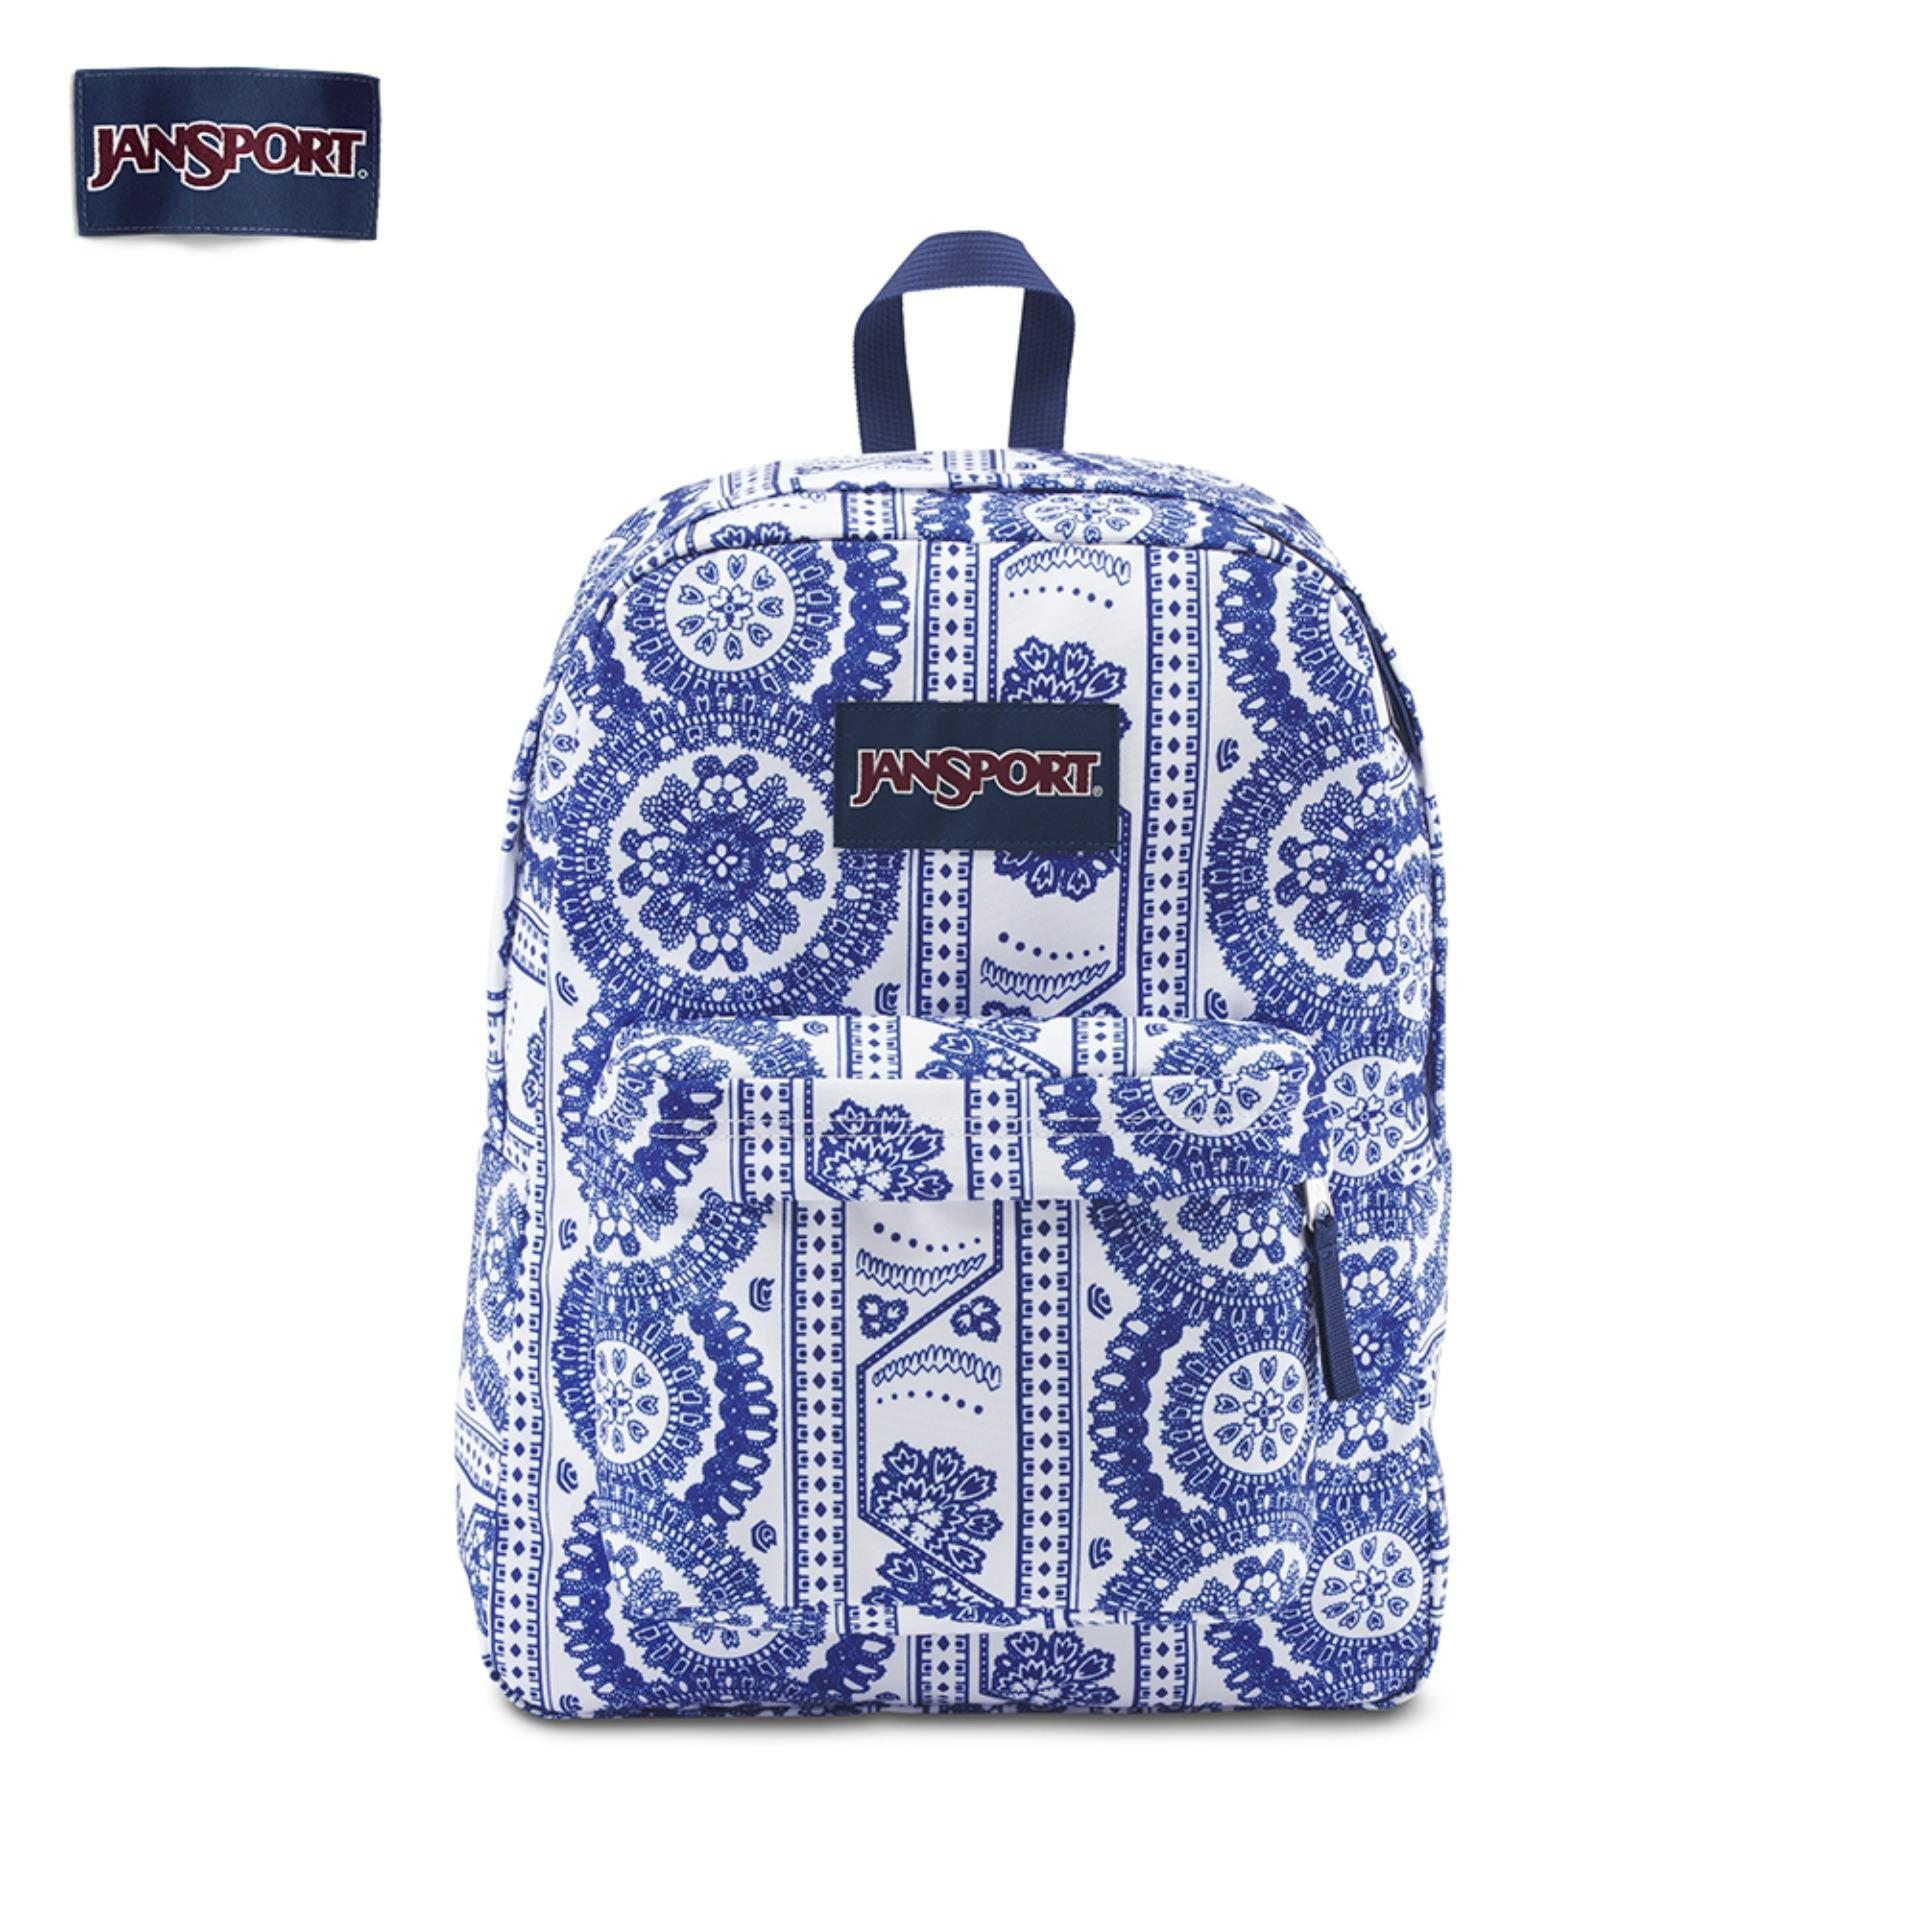 fb0495b7b8a0 JanSport Philippines  JanSport price list - JanSport Bags   Backpacks for  sale